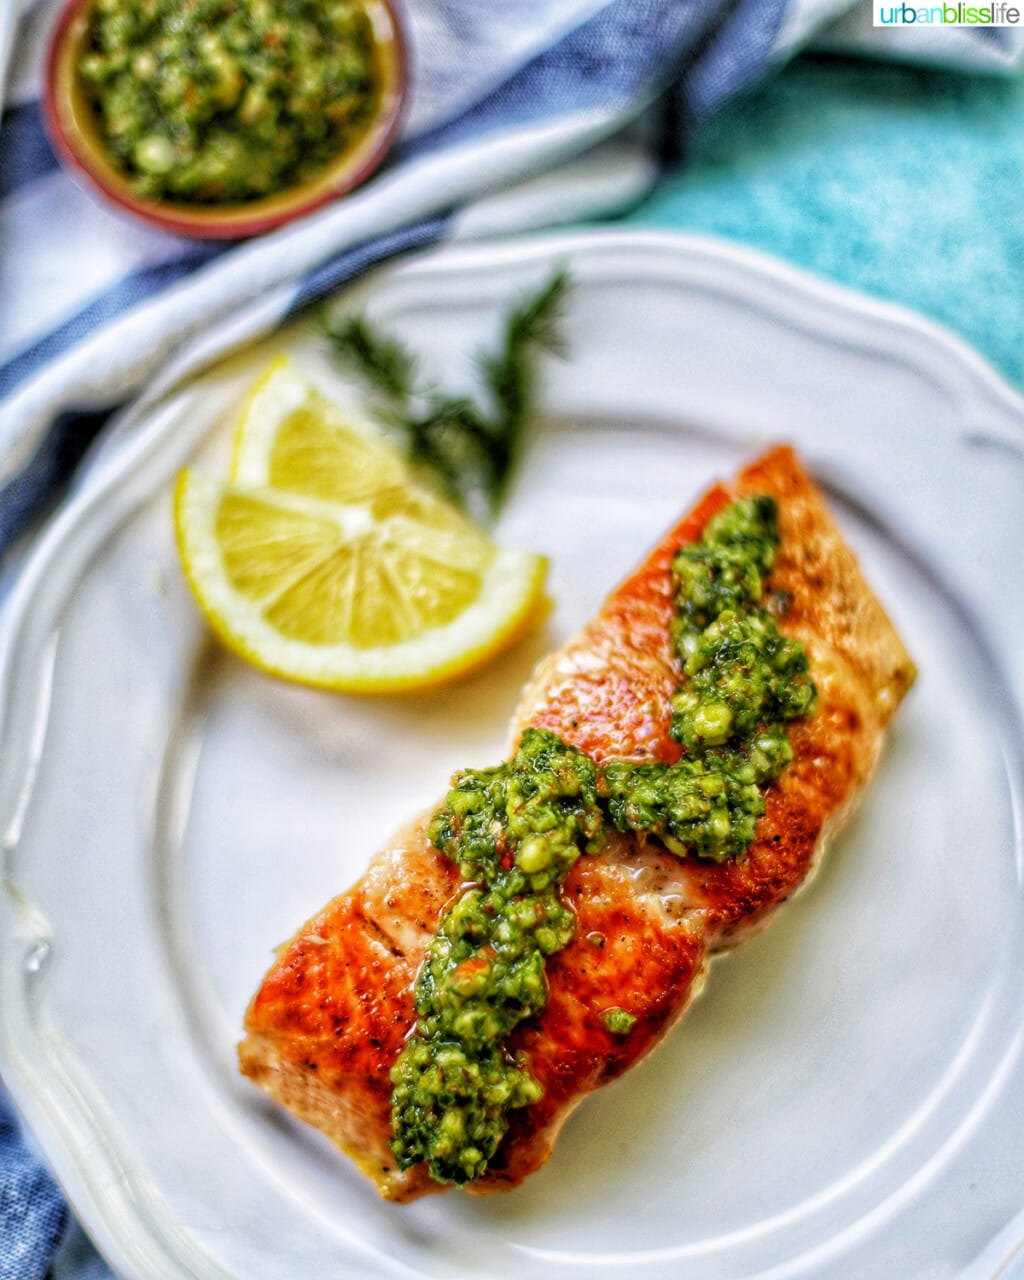 pan-seared salmon with almond basil pesto